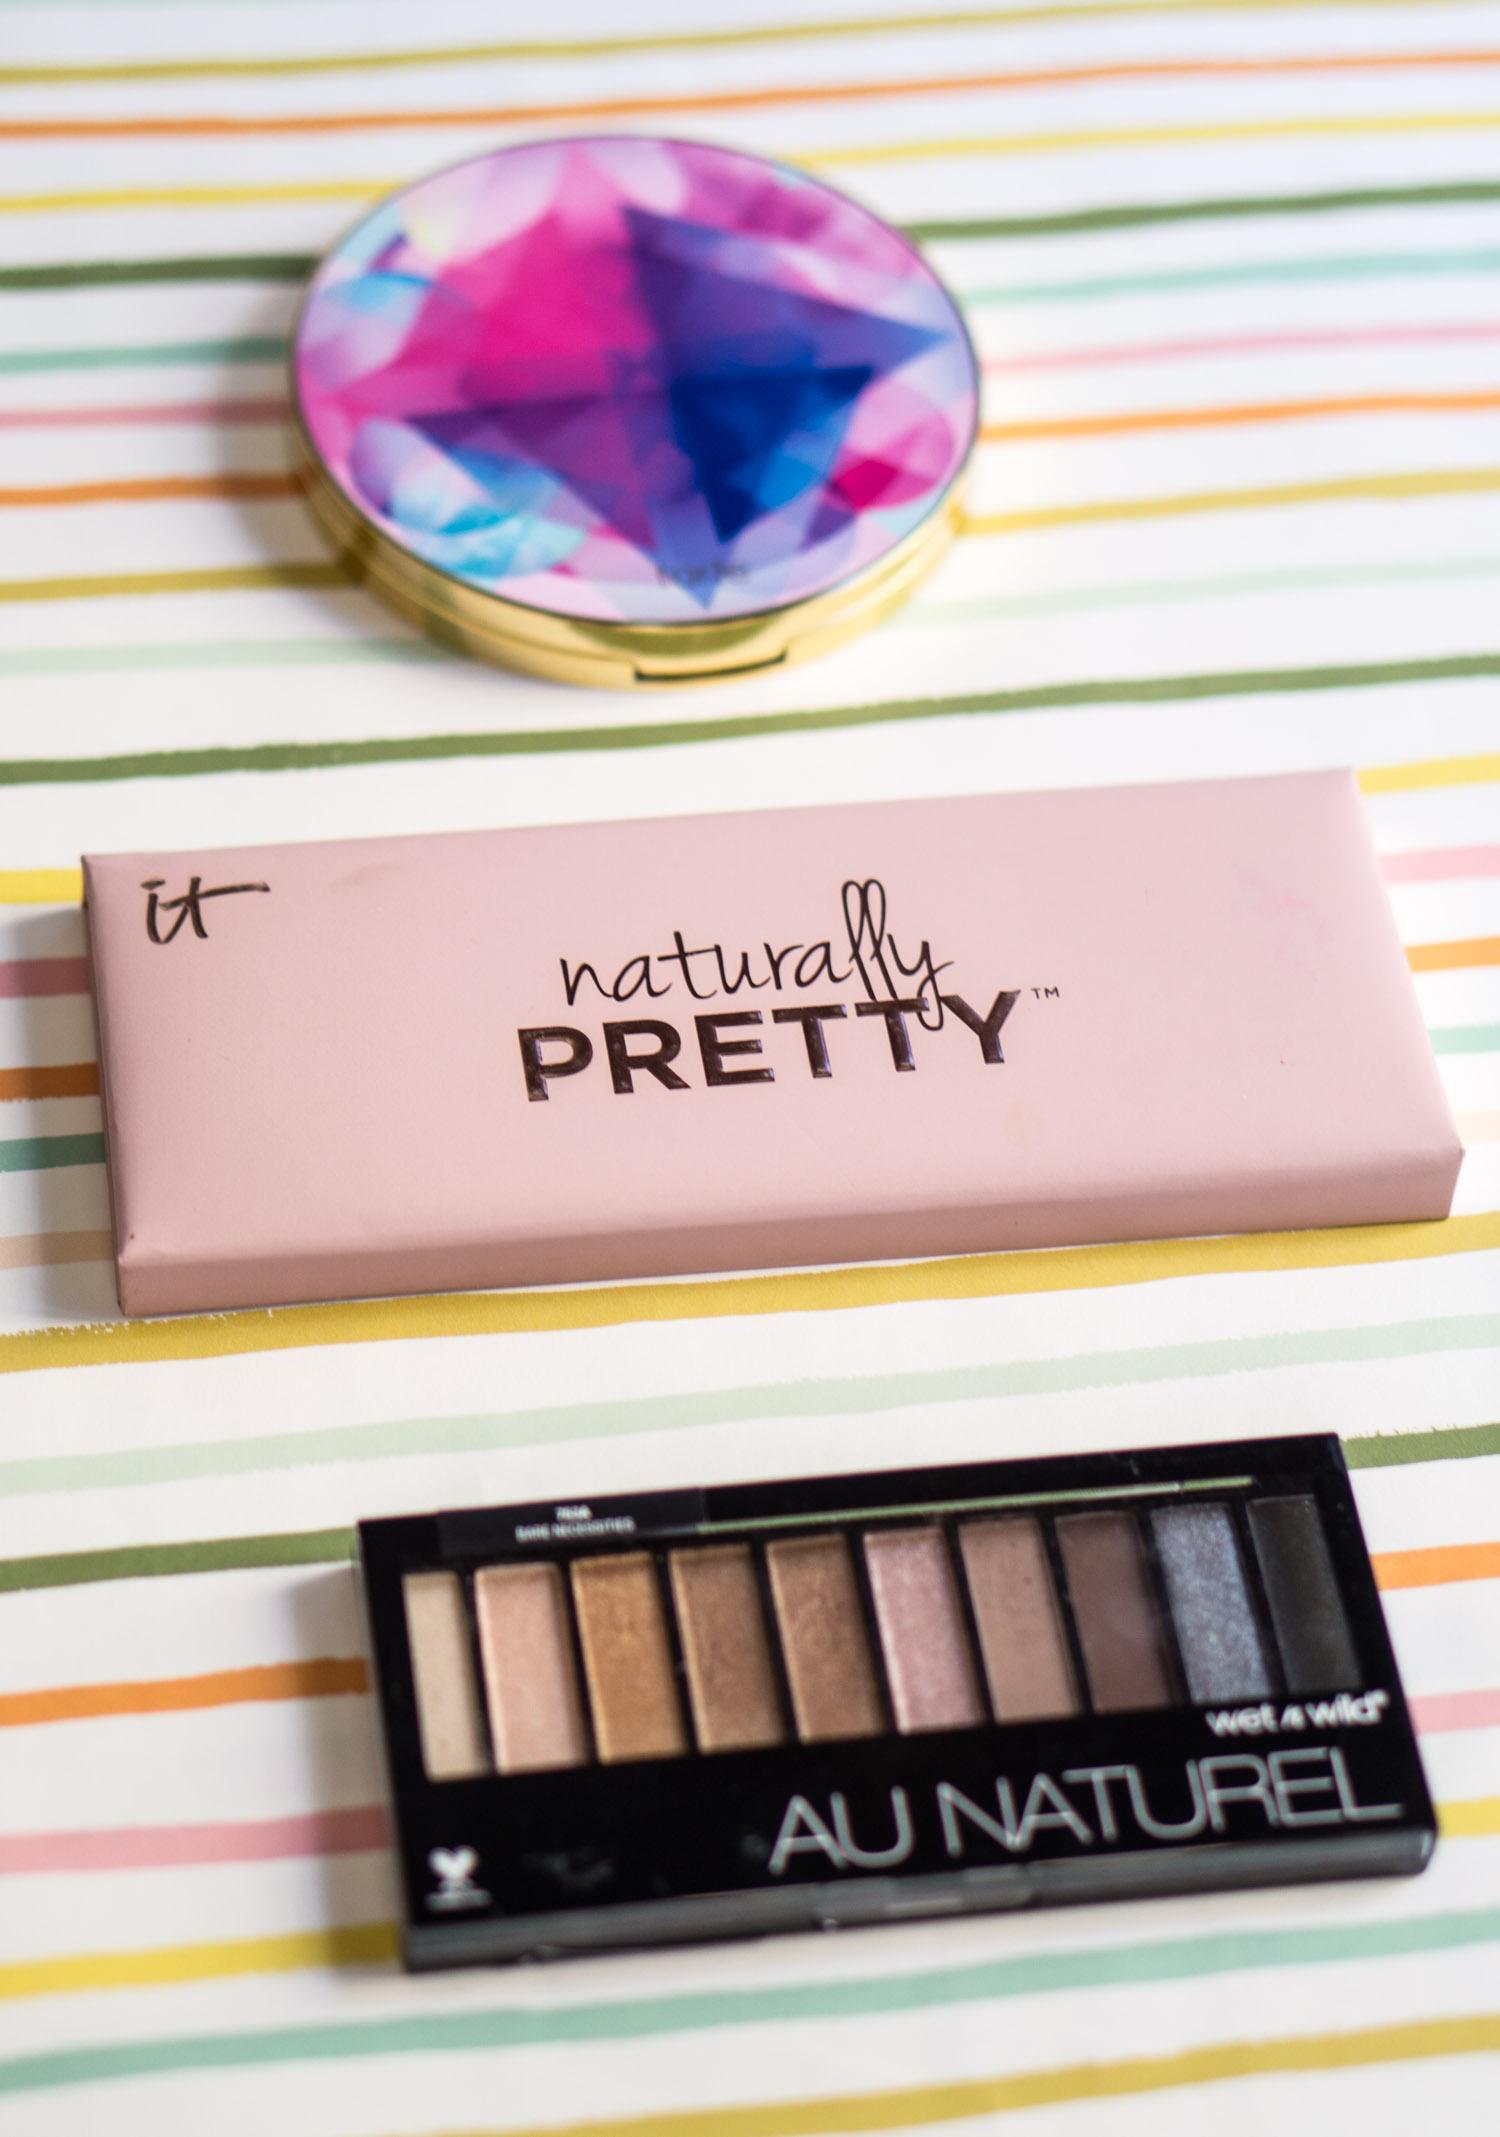 Stylesprinter May Beauty Favorites 2 Style Sprinter Wet N Wild Au Naturel Palette Eye Shadow Review